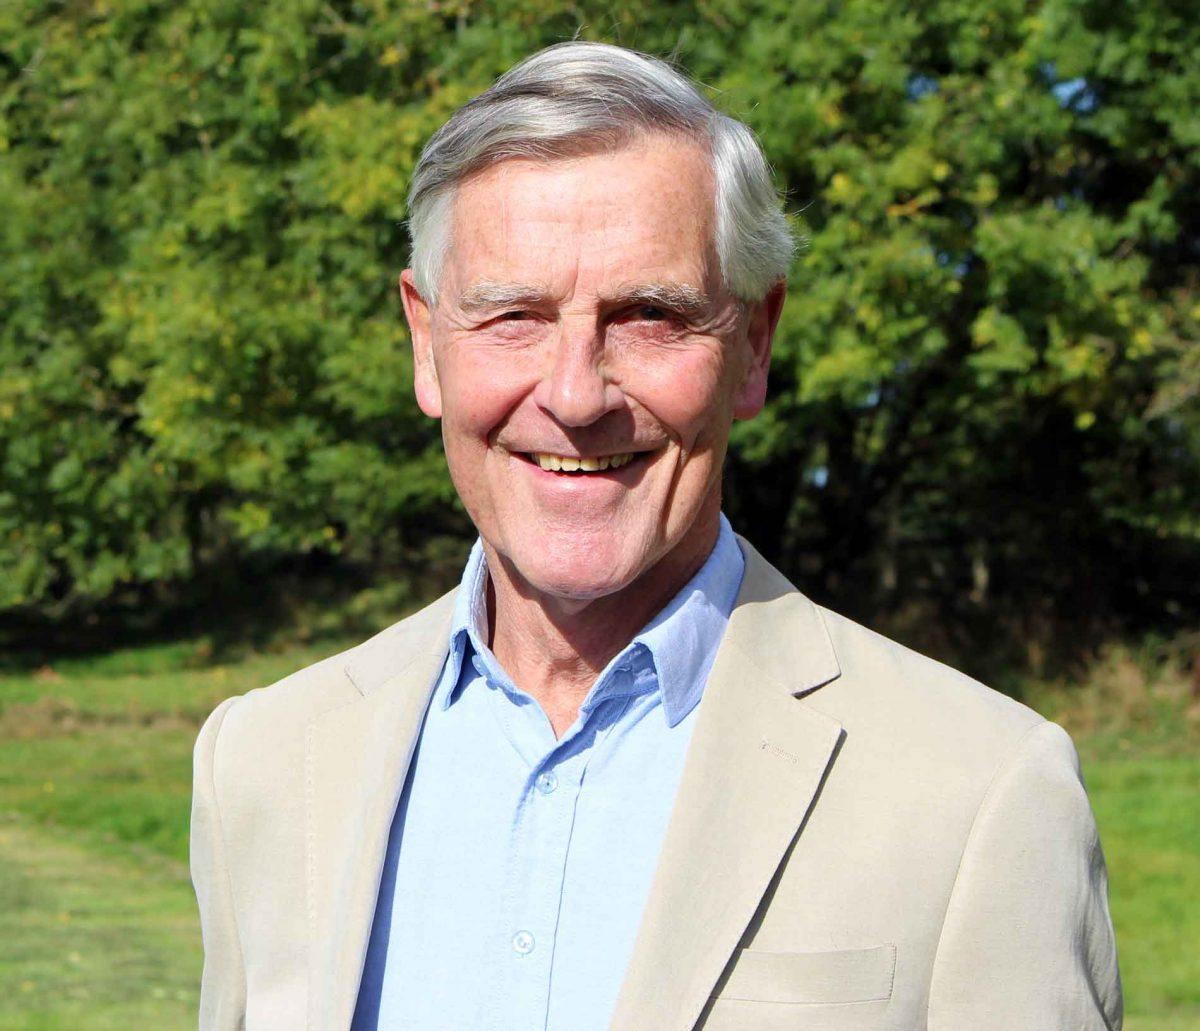 Councillor Nicholas White